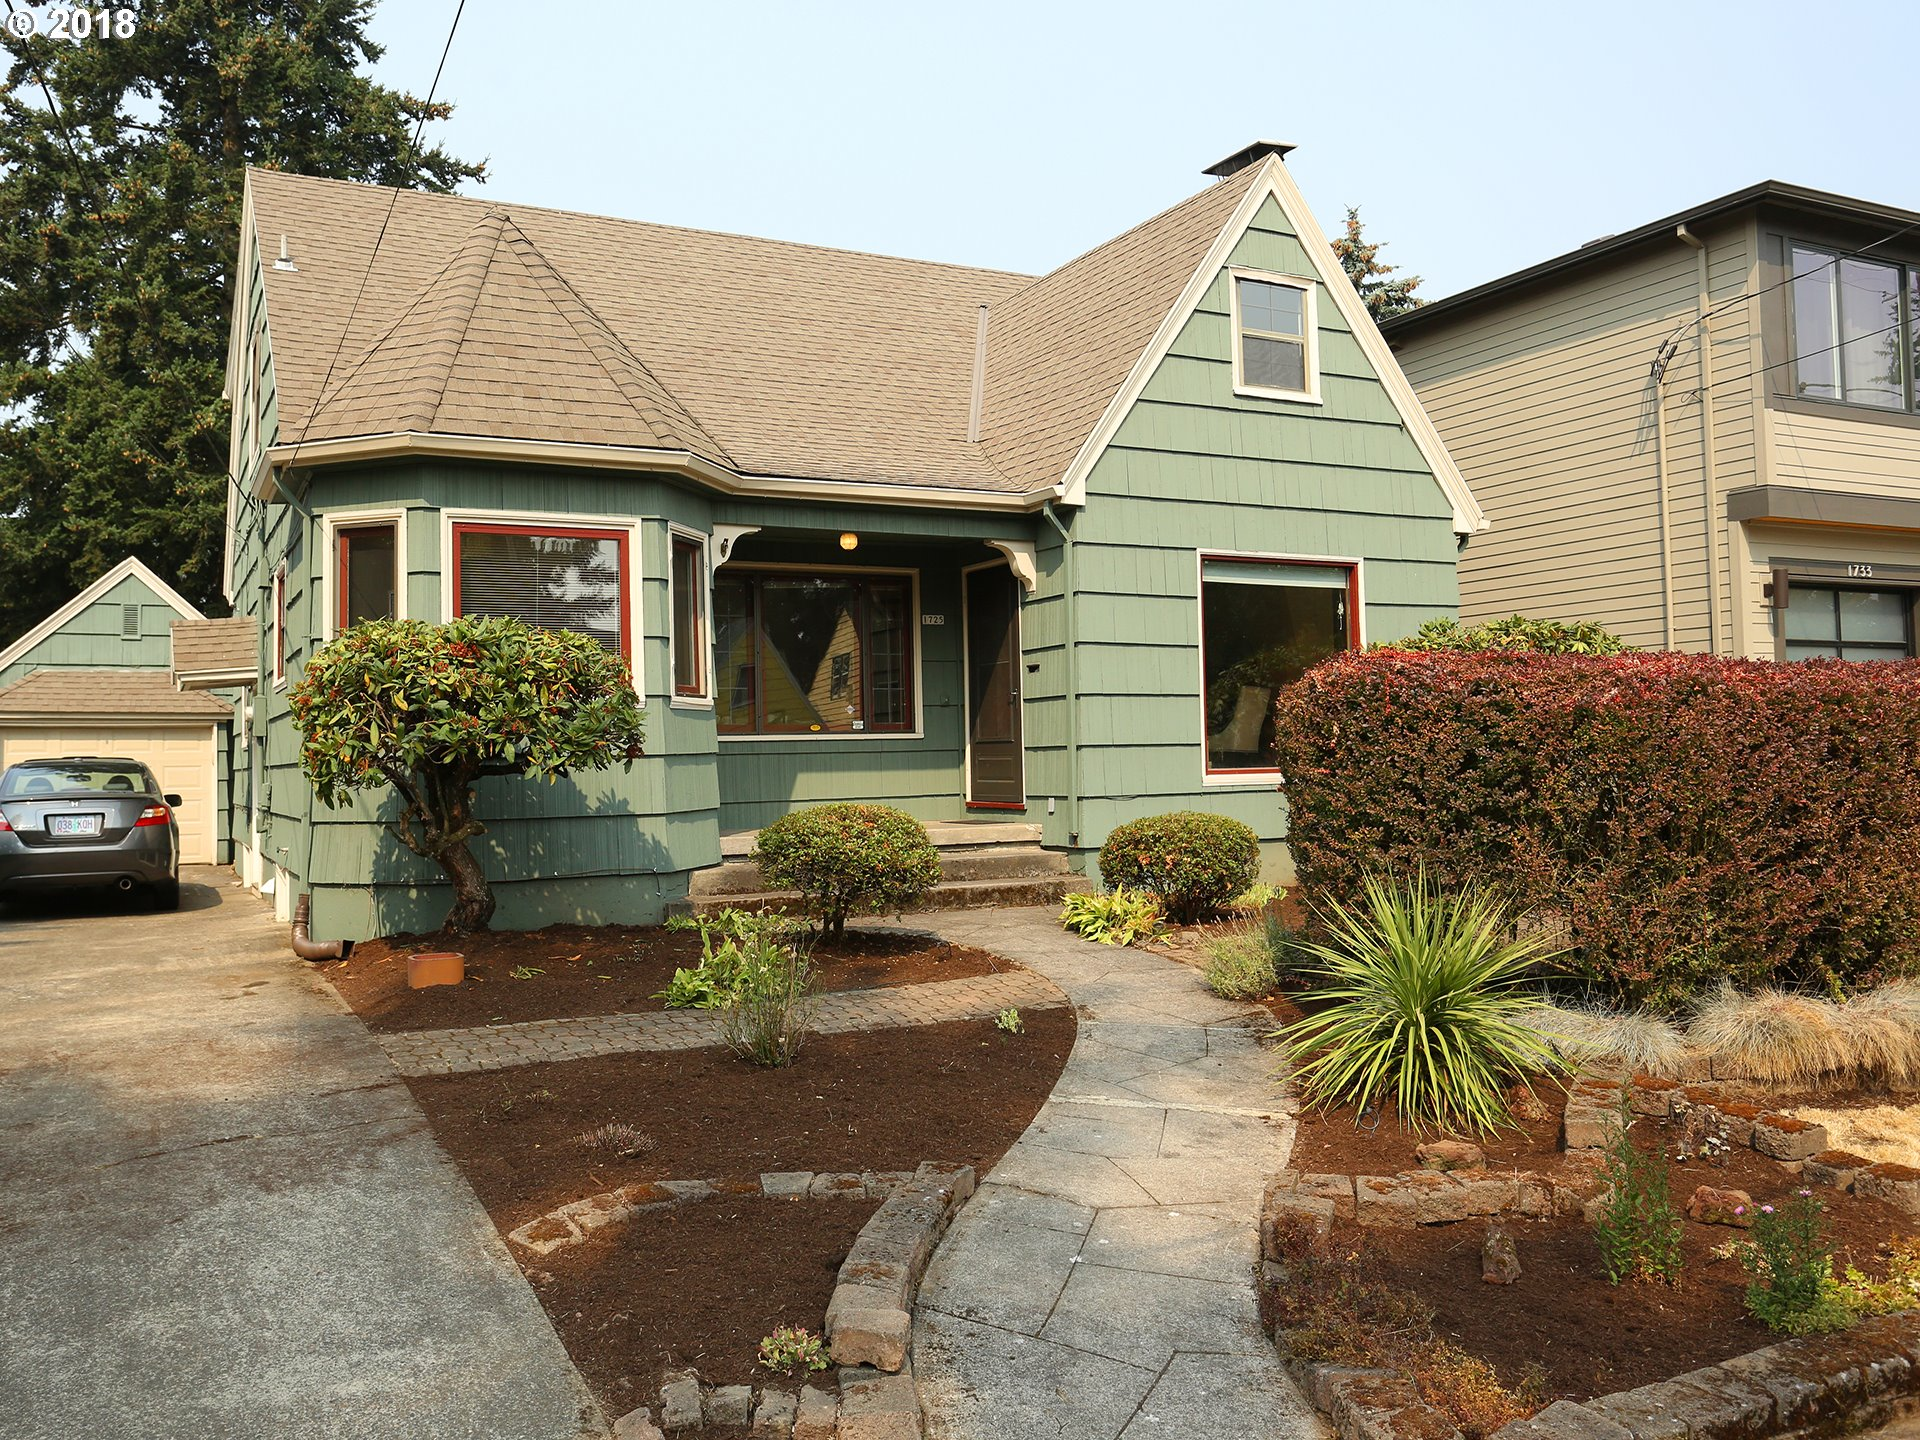 Tudor Homes for Sale in Portland Oregon